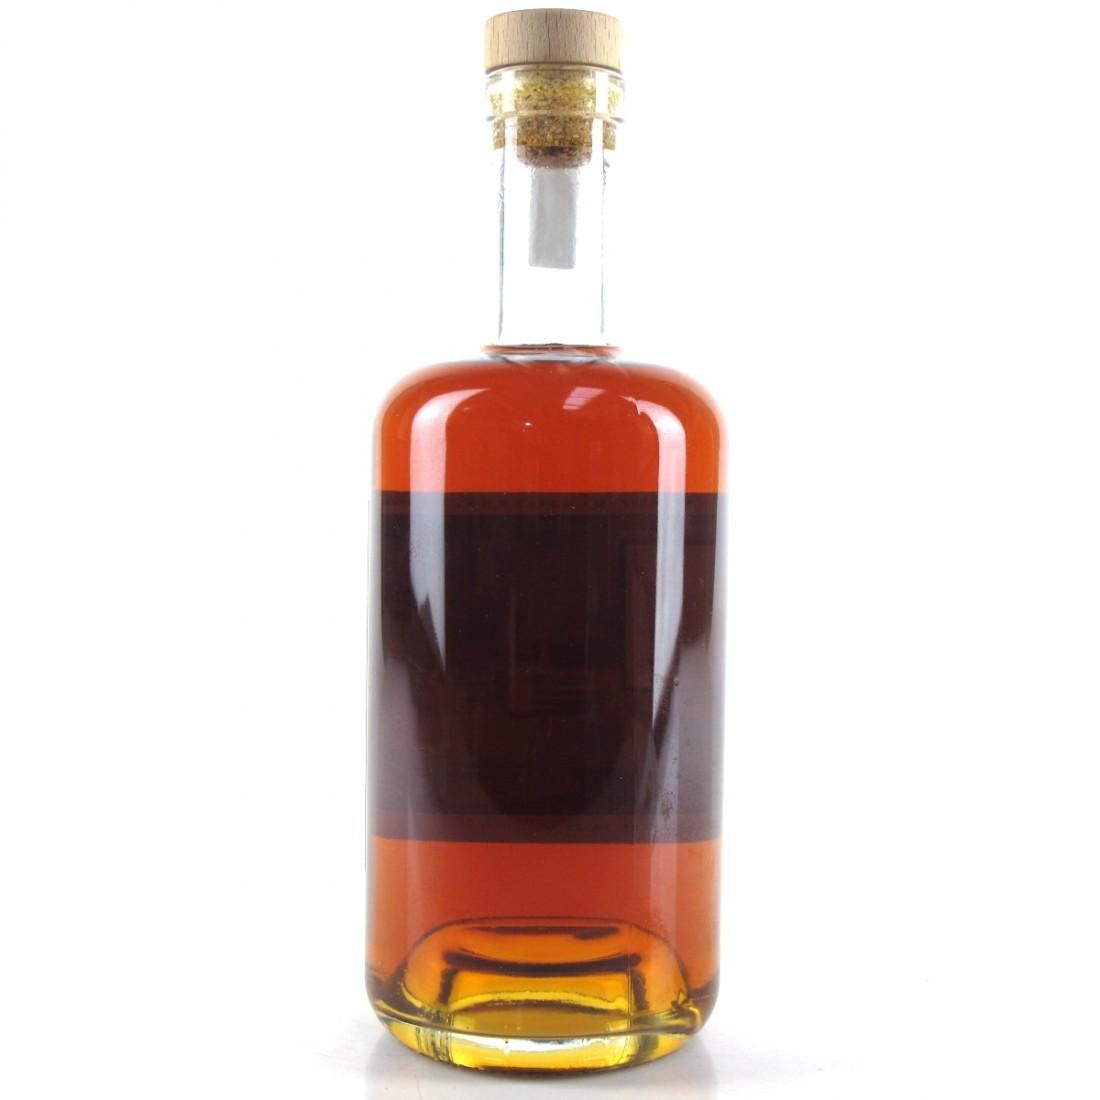 Twenty Third St Prime 5 Year Old Australian Brandy